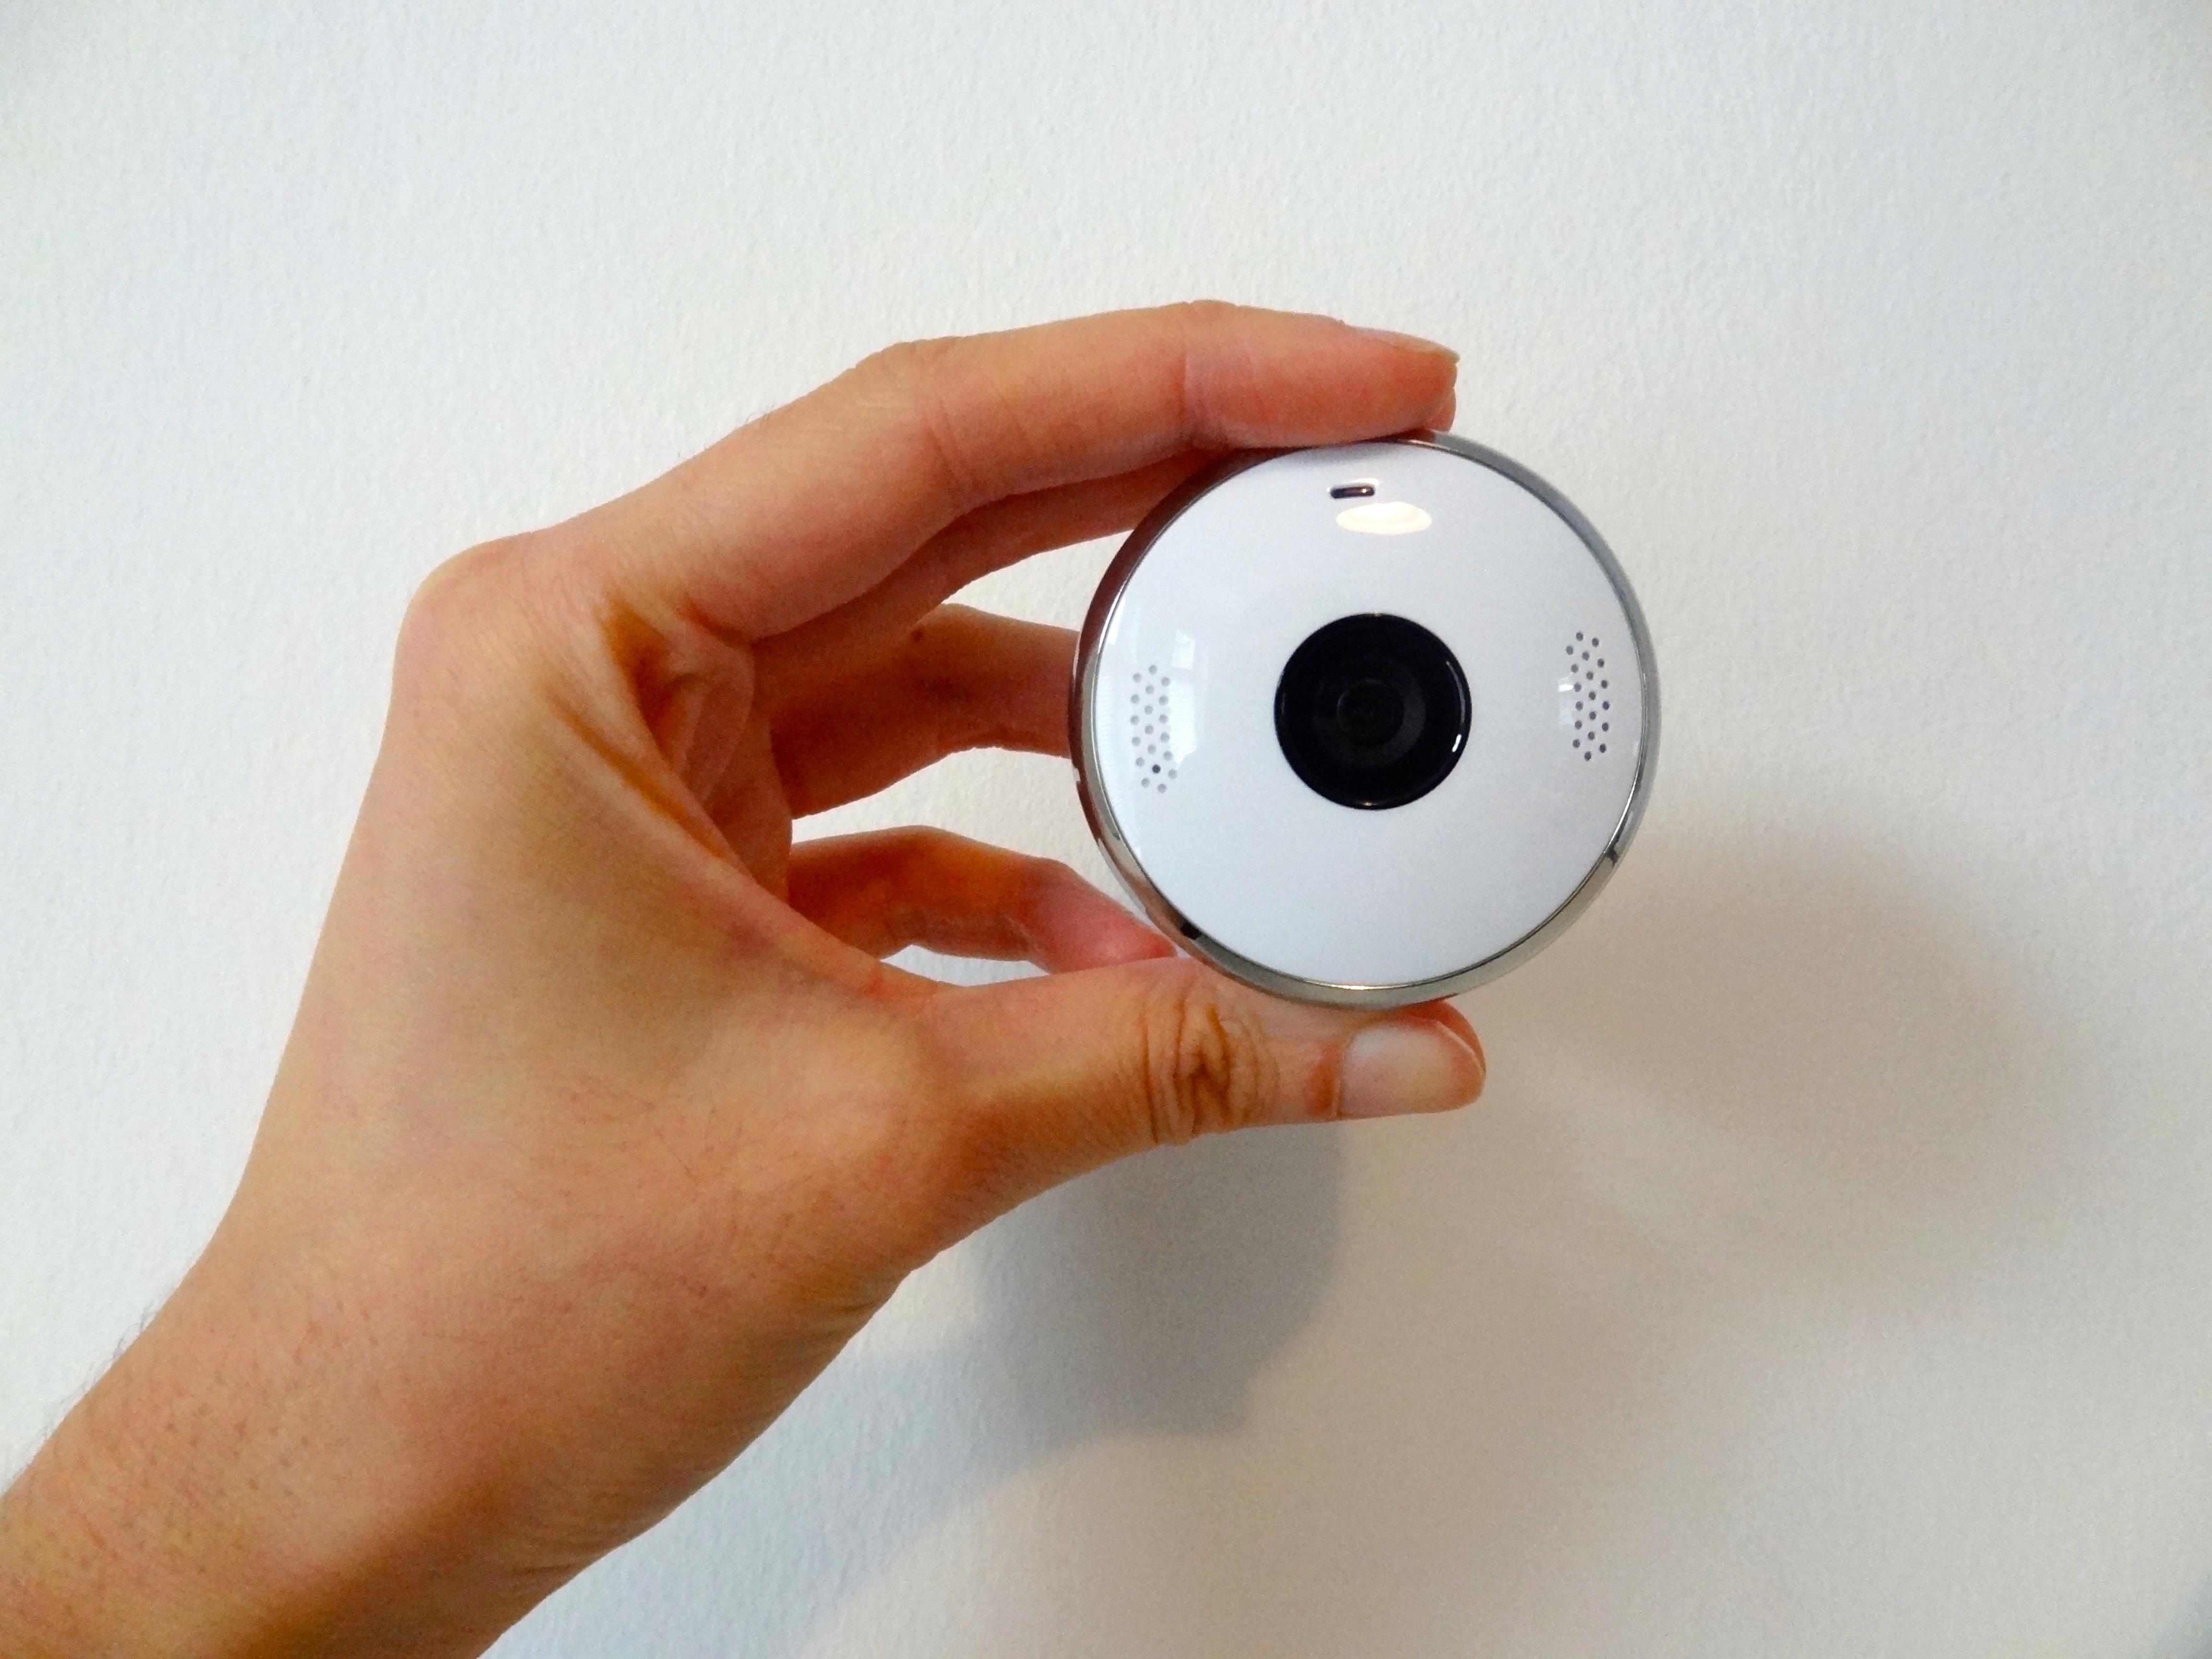 Small light-weight camera